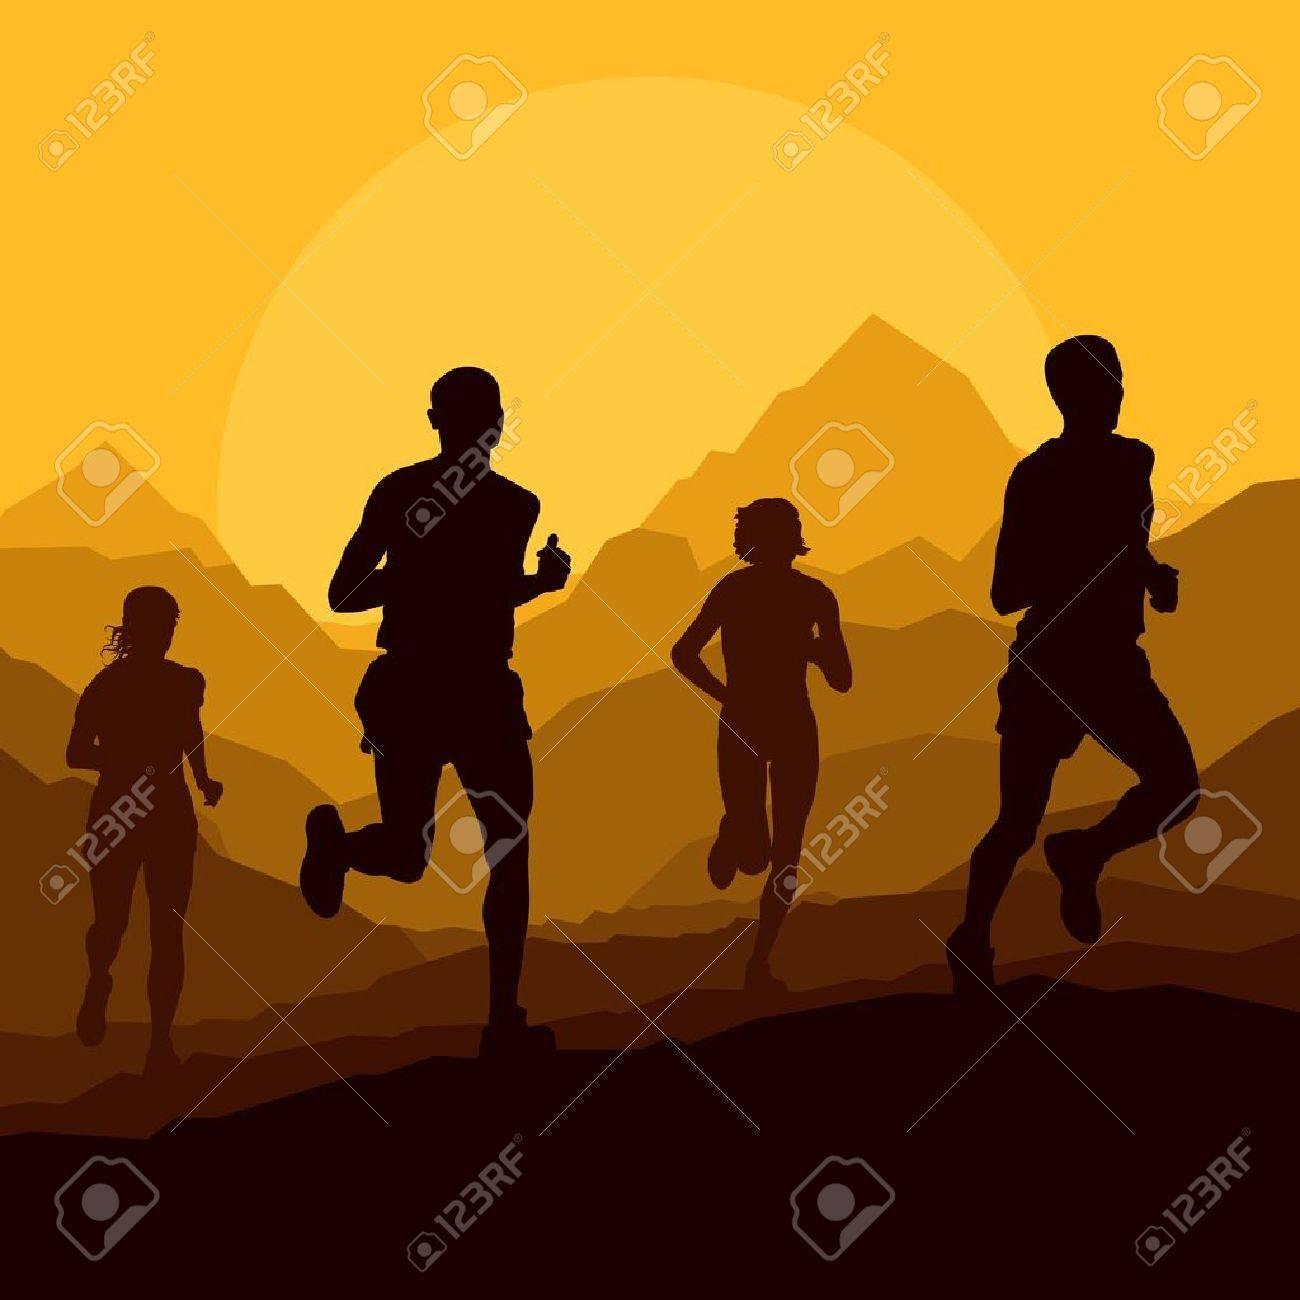 Marathon runners in wild nature mountain landscape background illustration vector Stock Vector - 16289048